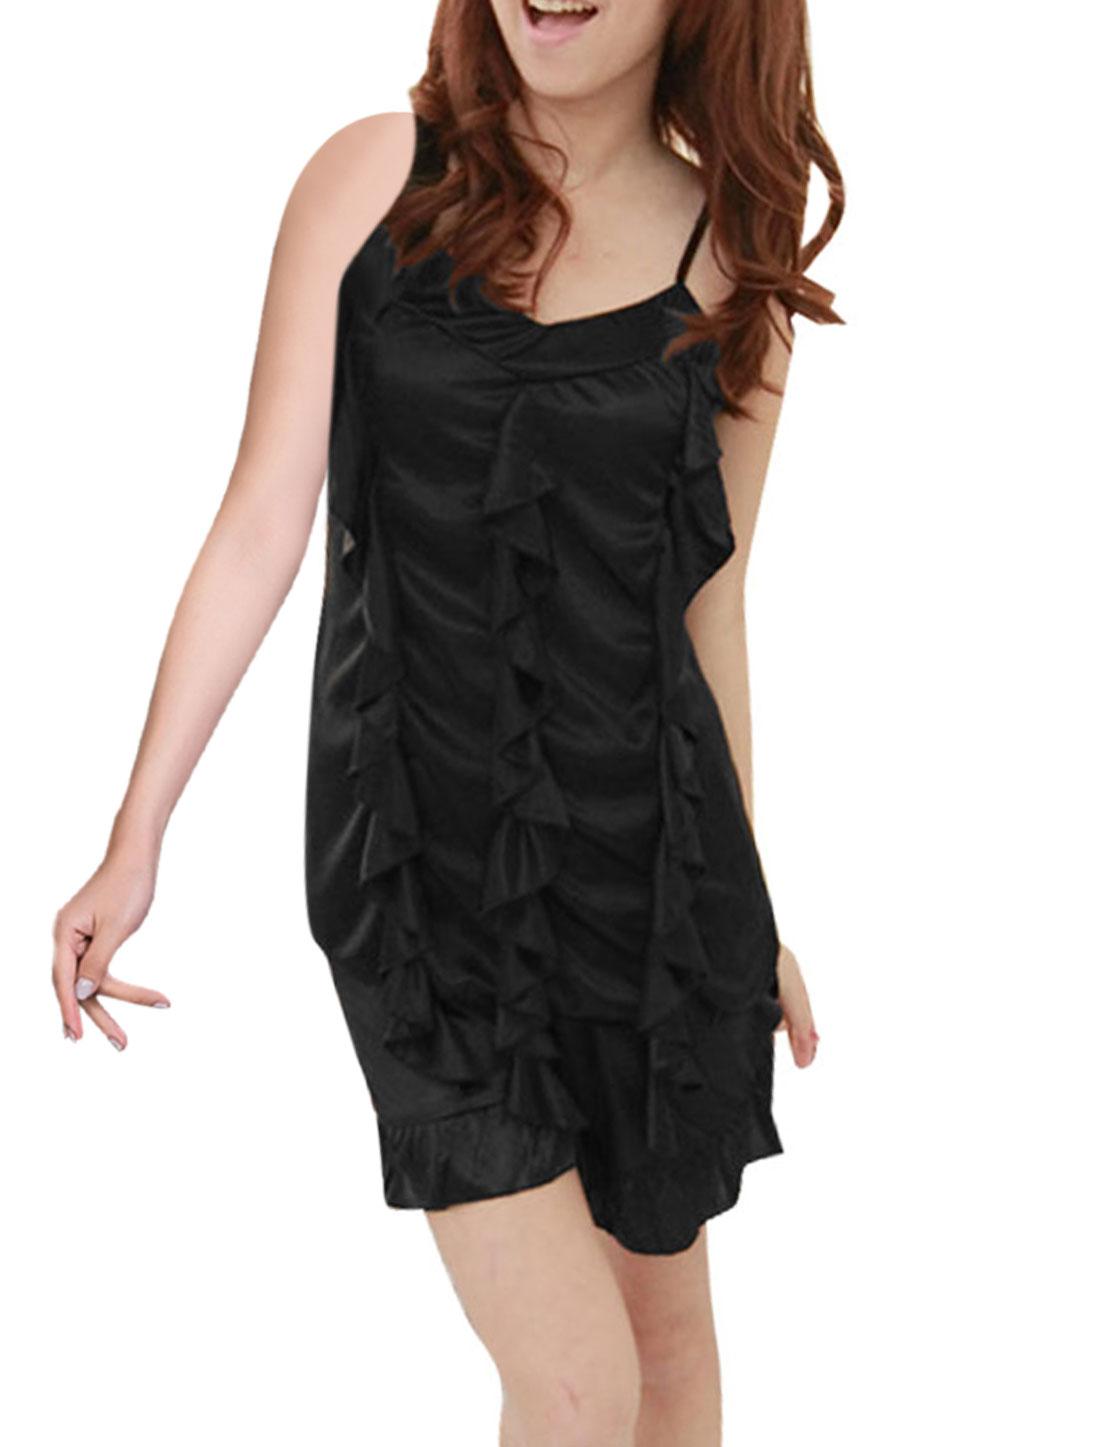 Lady Black Spaghetti Strap Flouncing V Neck Cami Sleepwear Set XS